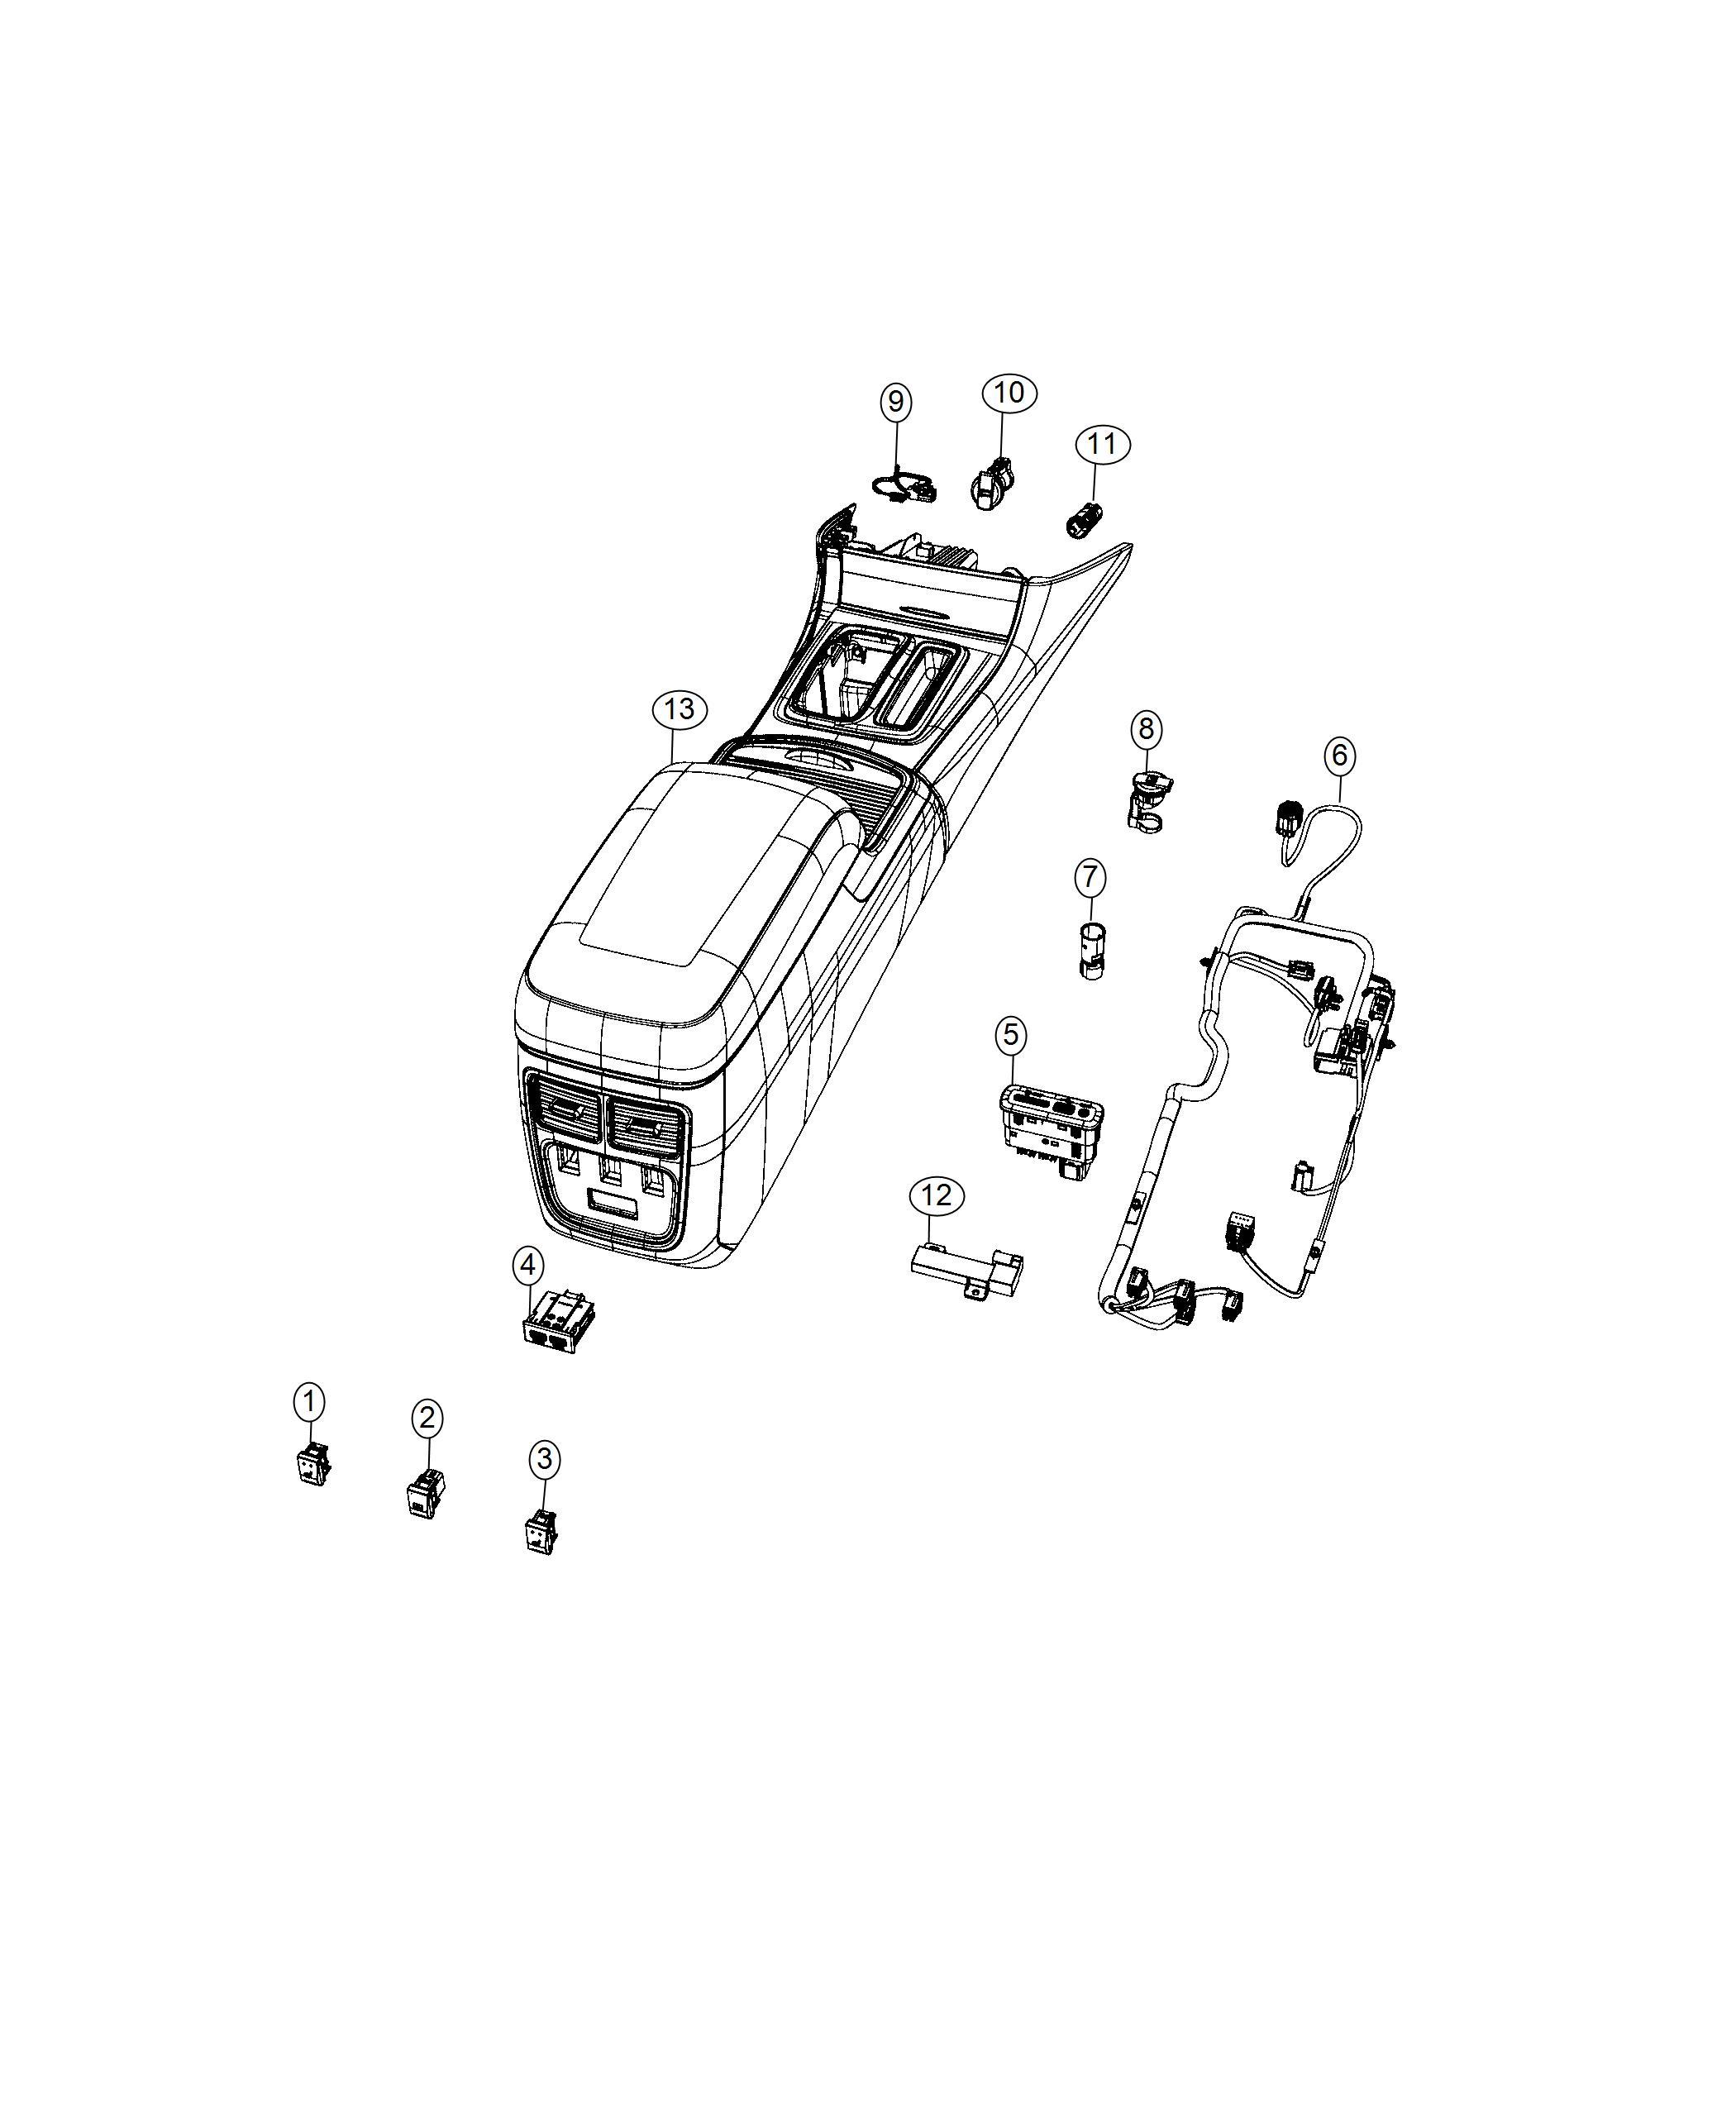 Chrysler 300 Media Center  Reflector  Usb Port  Hub  Media Hub  Sd Usb Charging